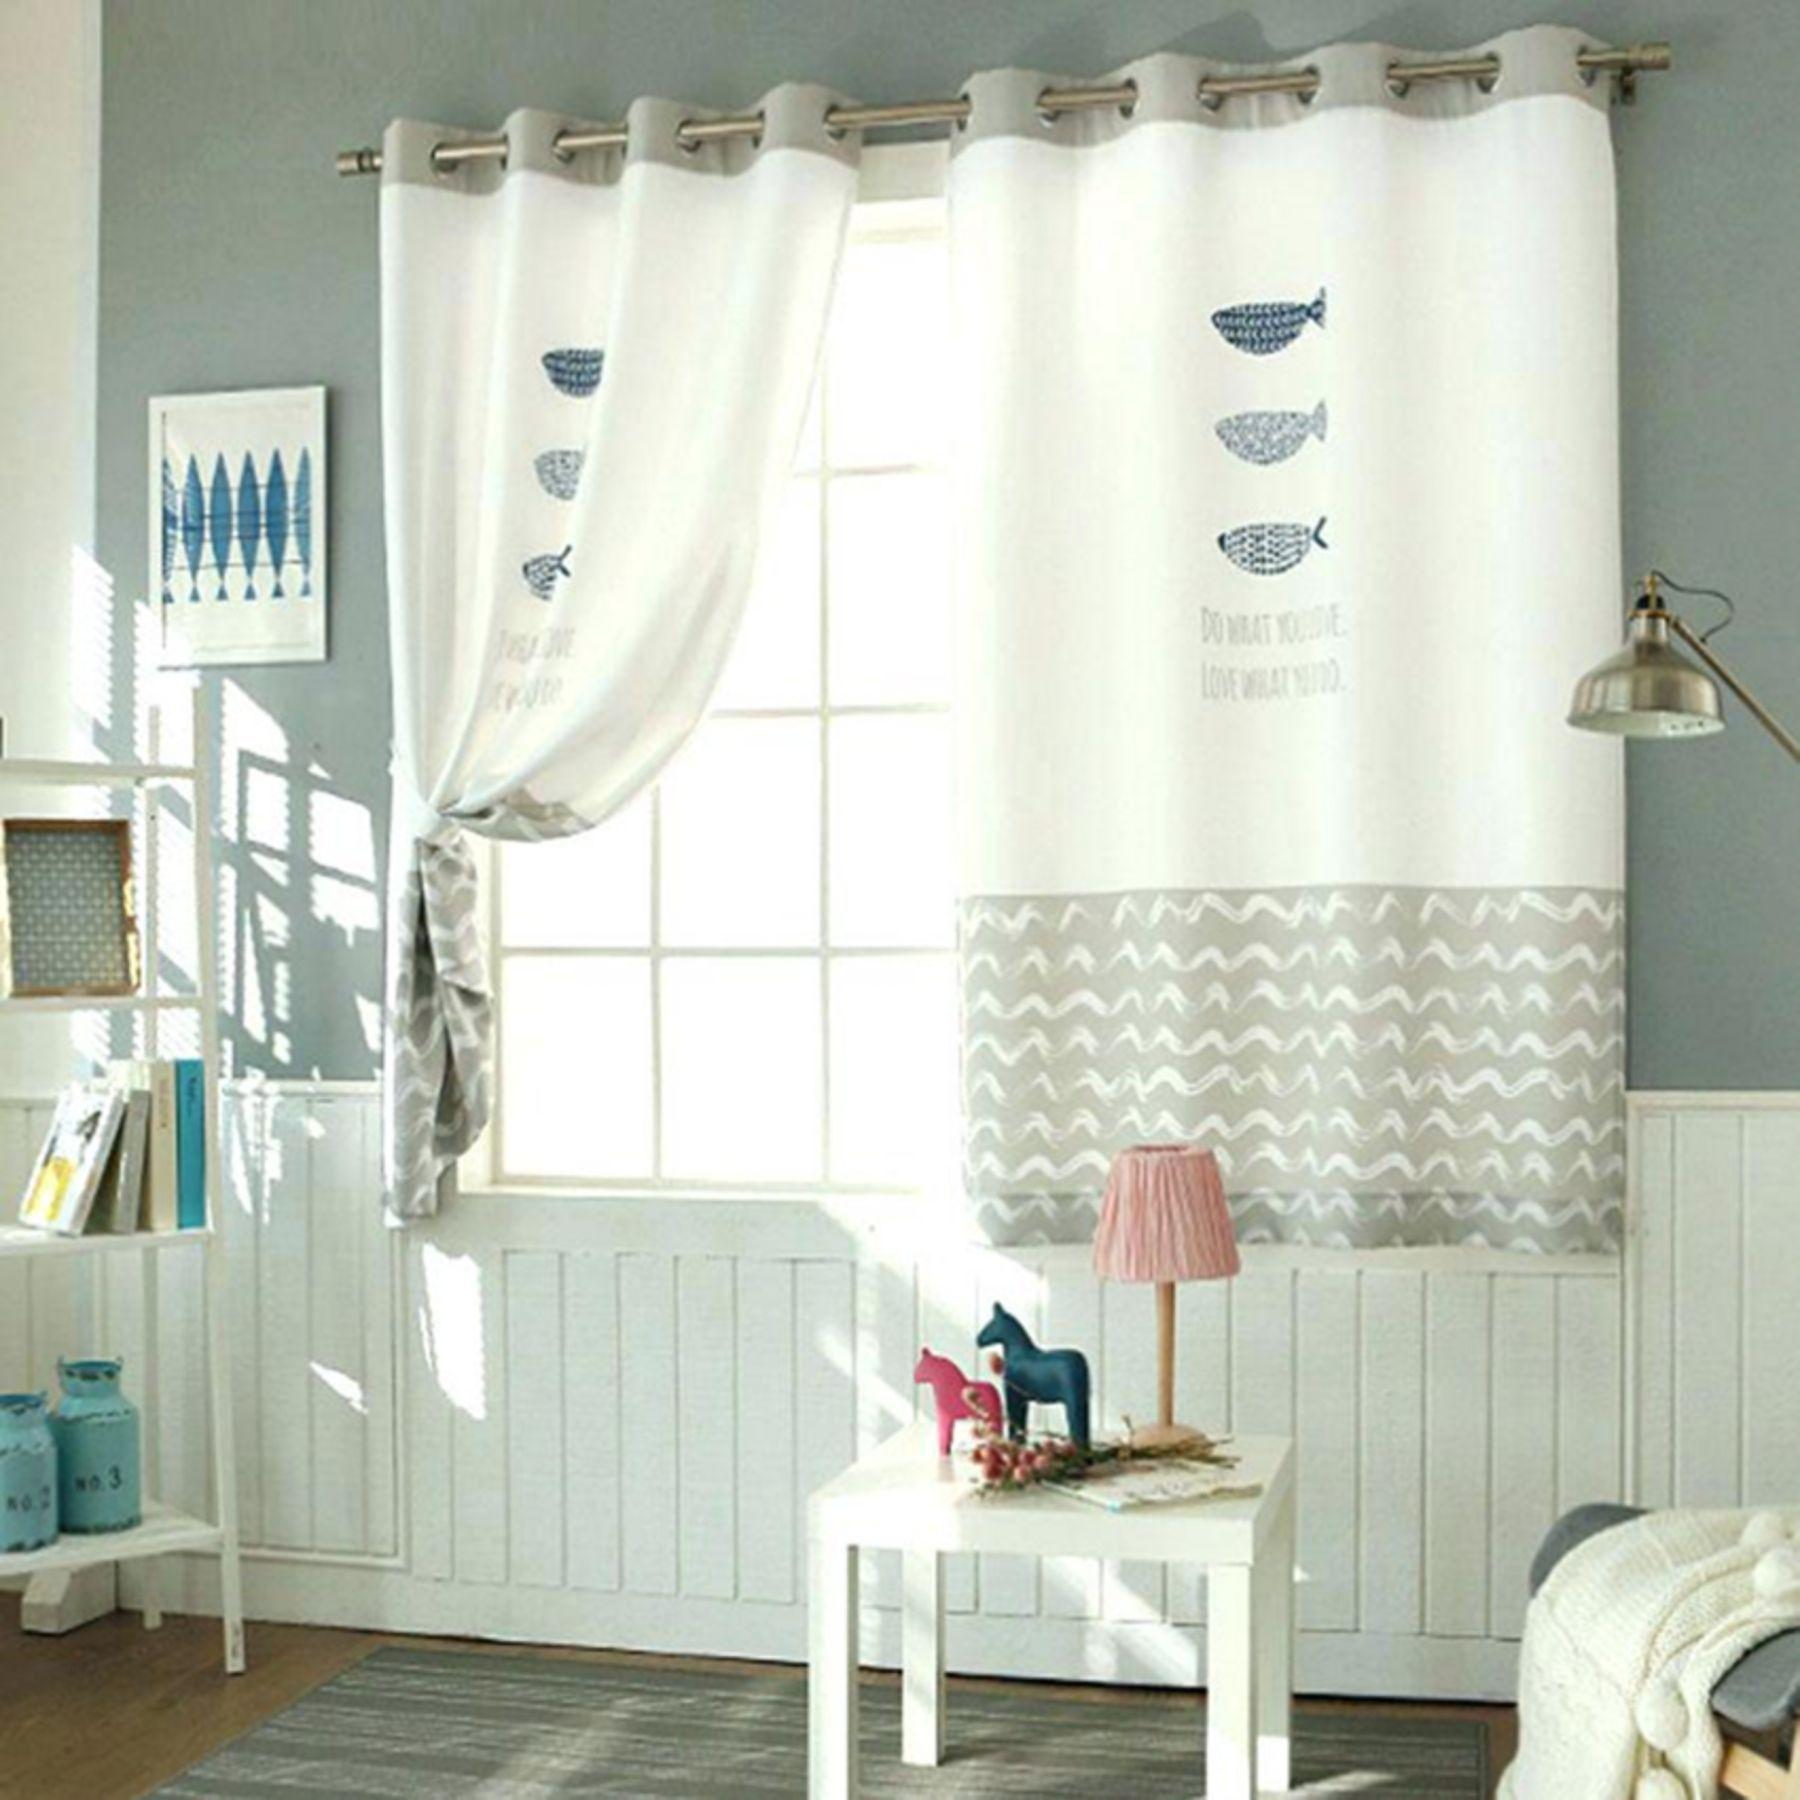 Nice 20 Beautiful Bedroom Curtain Design Ideas For Children Https Hroomy Com Bedroom 20 Beautiful Bedroom Curt Kids Curtains Boys Curtains Childrens Curtains Lined bedroom curtains ideas